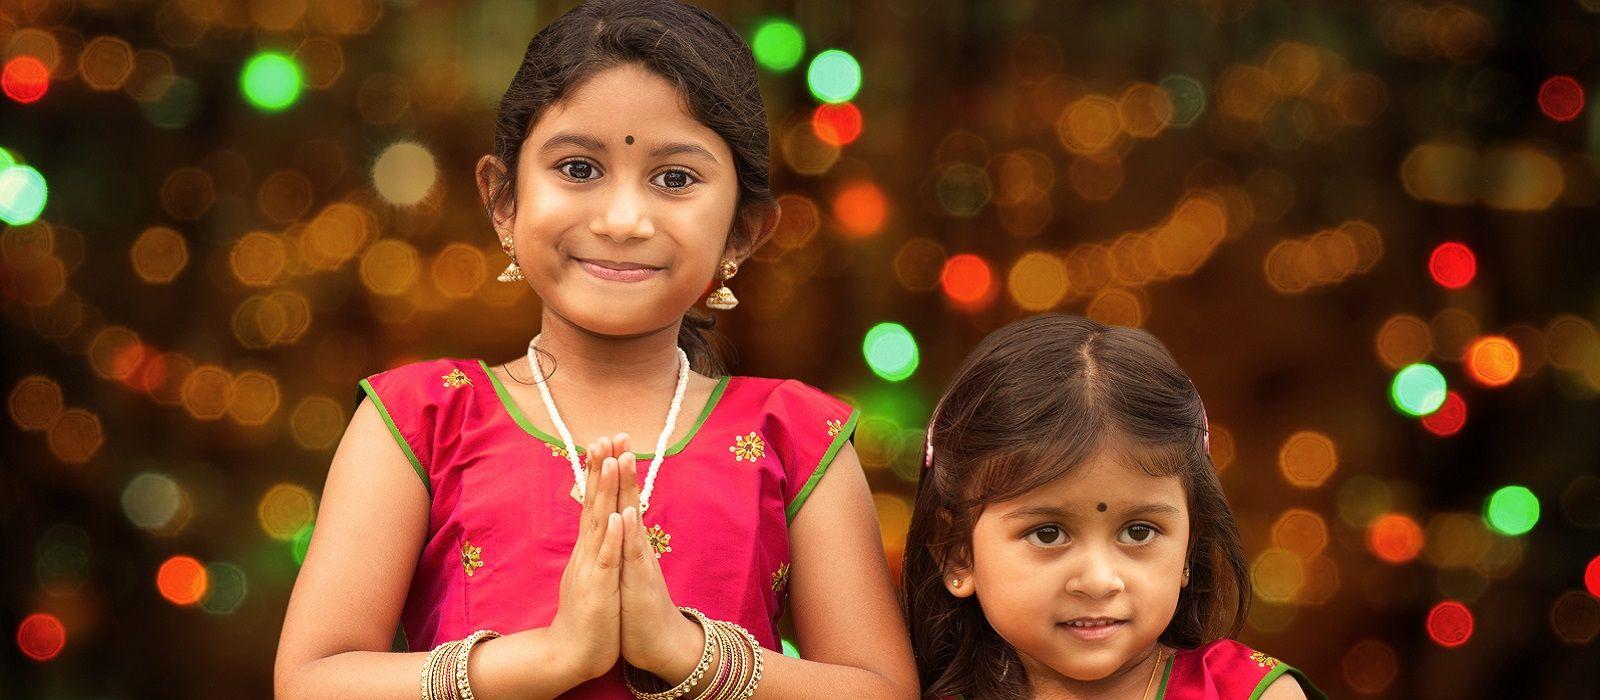 Festival Fieber: Diwali in Indien Urlaub 1